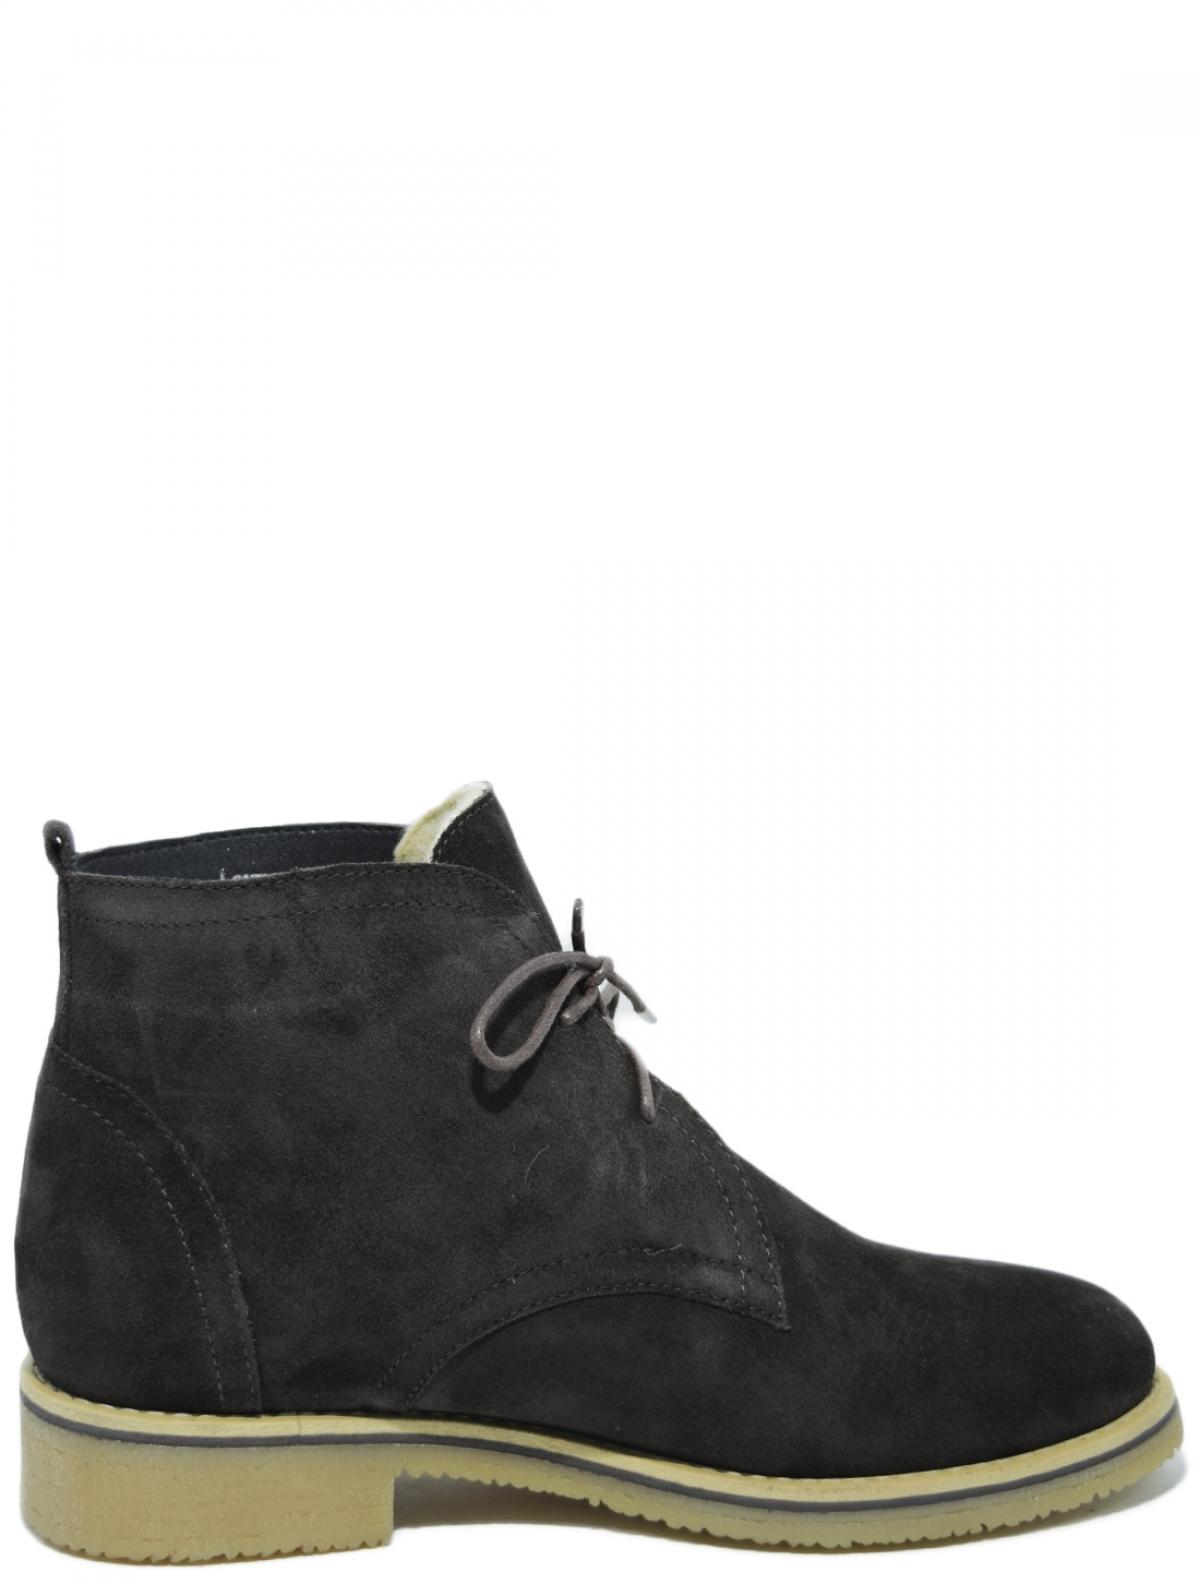 Selm 1911-29 женские ботинки